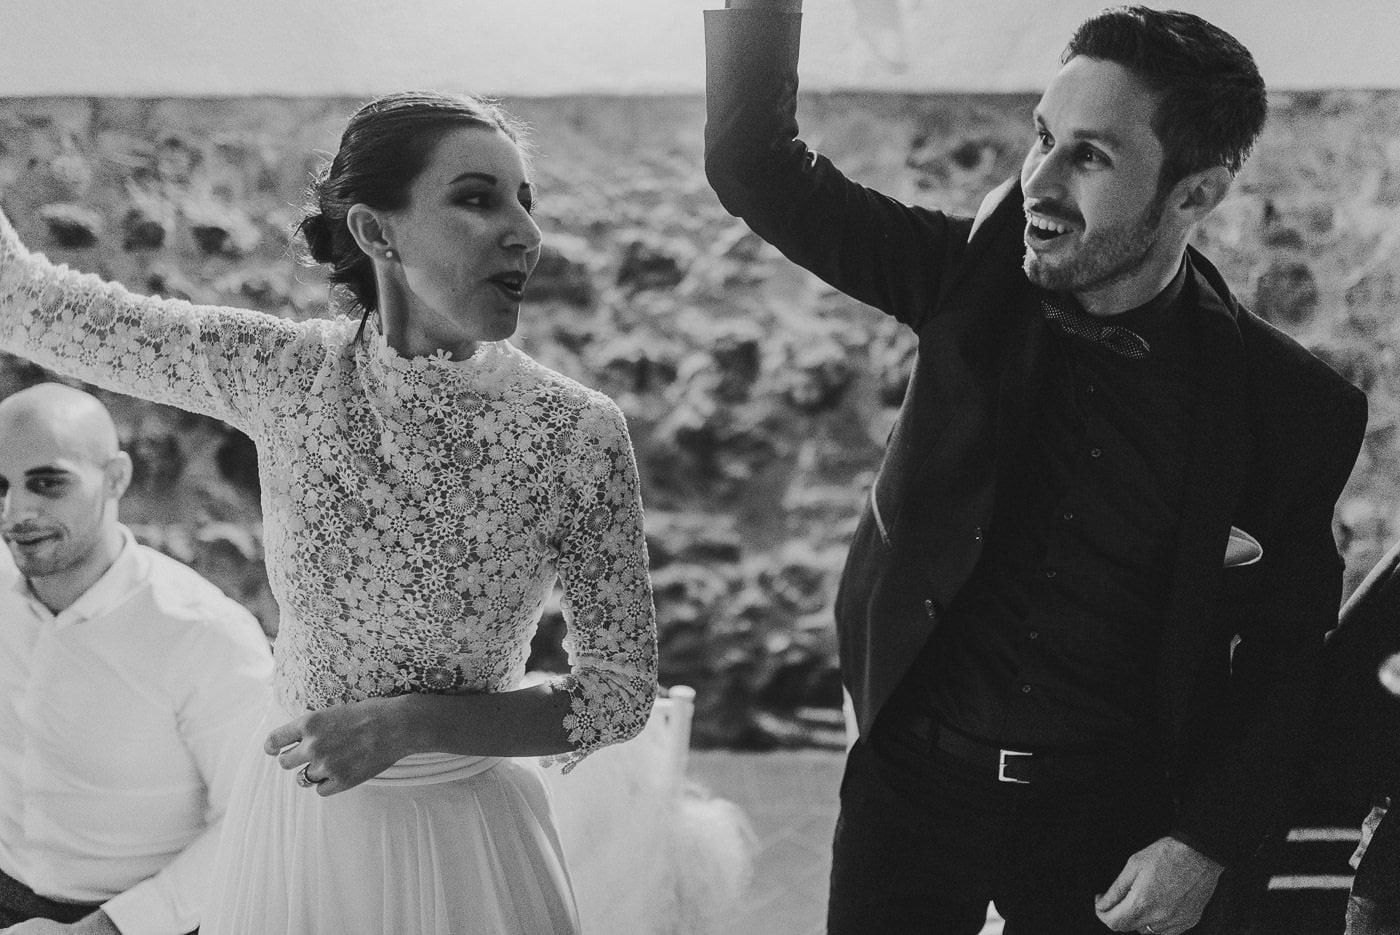 Matrimonio Giulia & Alessandro 28_12 – Alessio Nobili Photographer-61